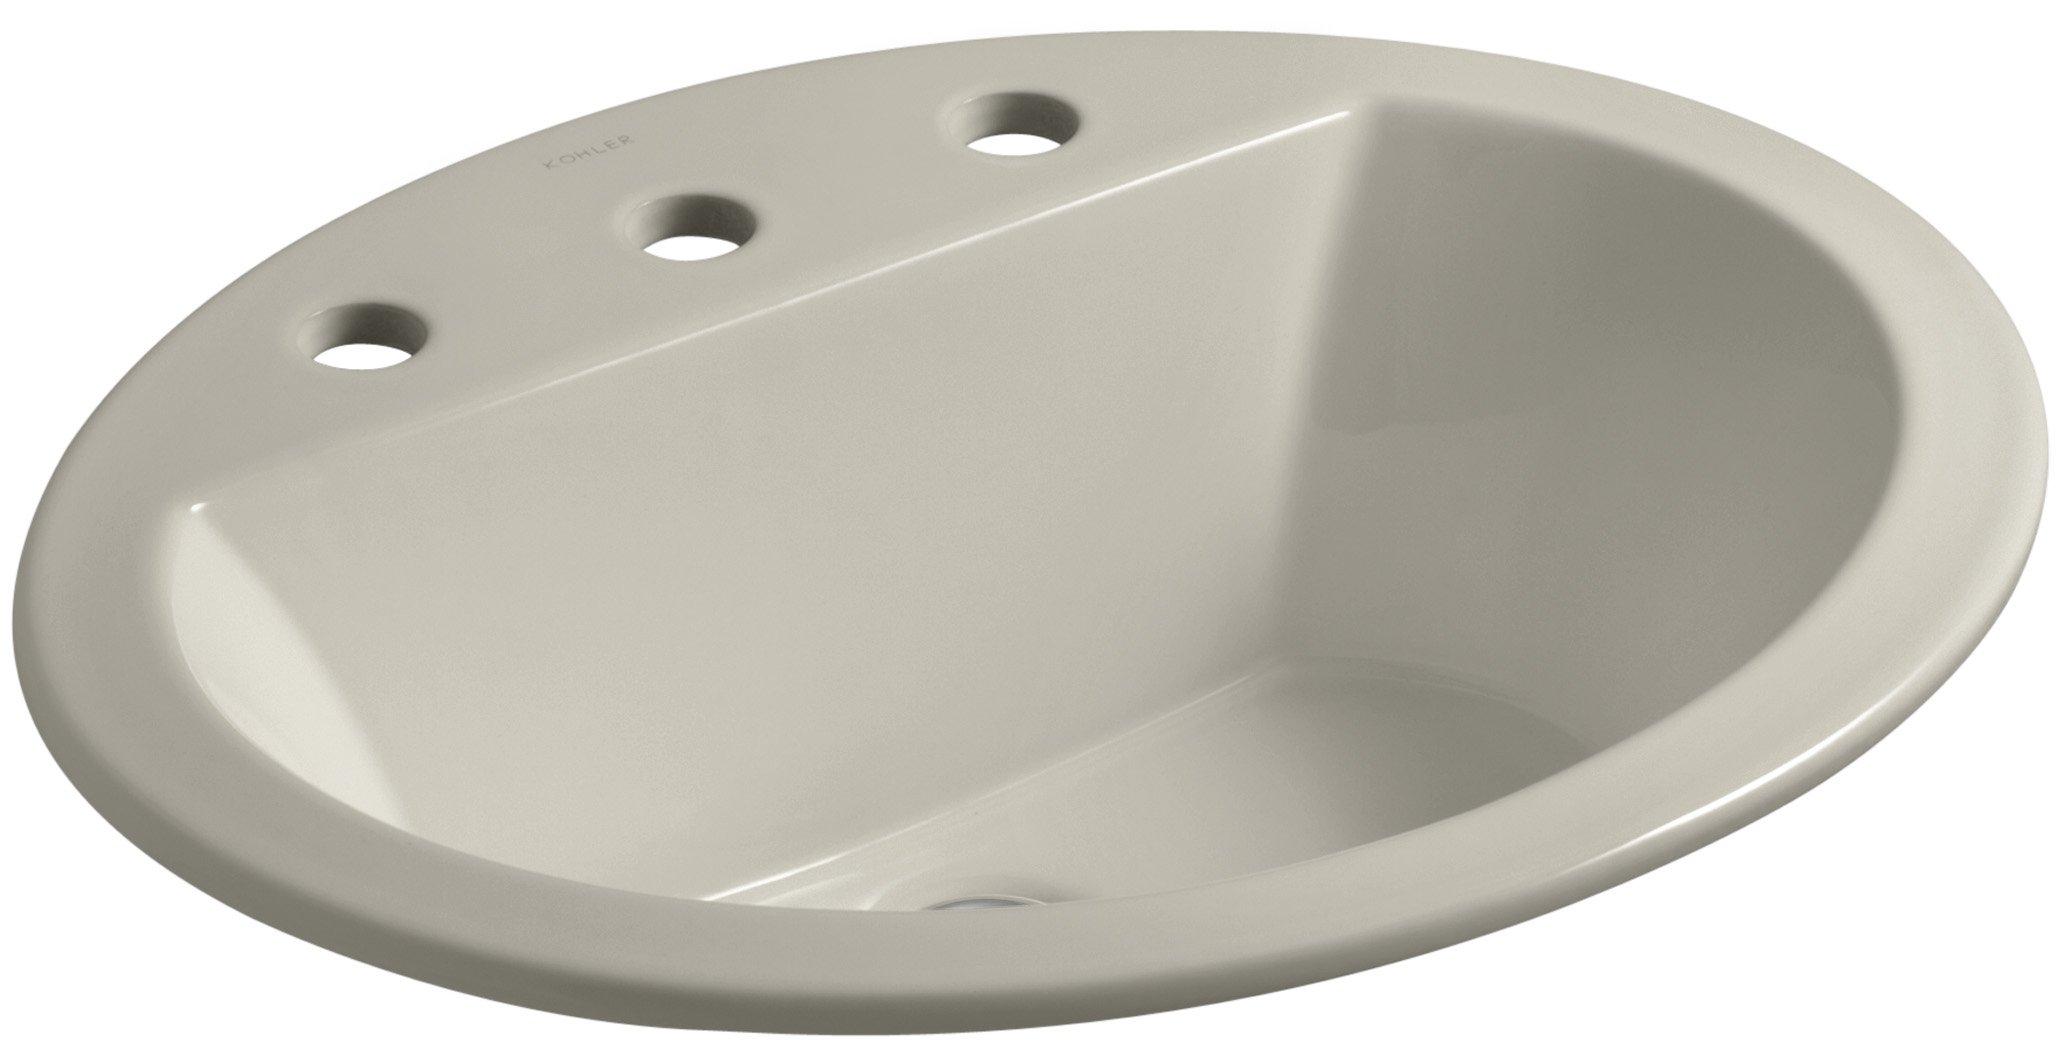 KOHLER K-2699-8-G9 Bryant Oval Self-Rimming Bathroom Sink with 8'' Centers, Sandbar